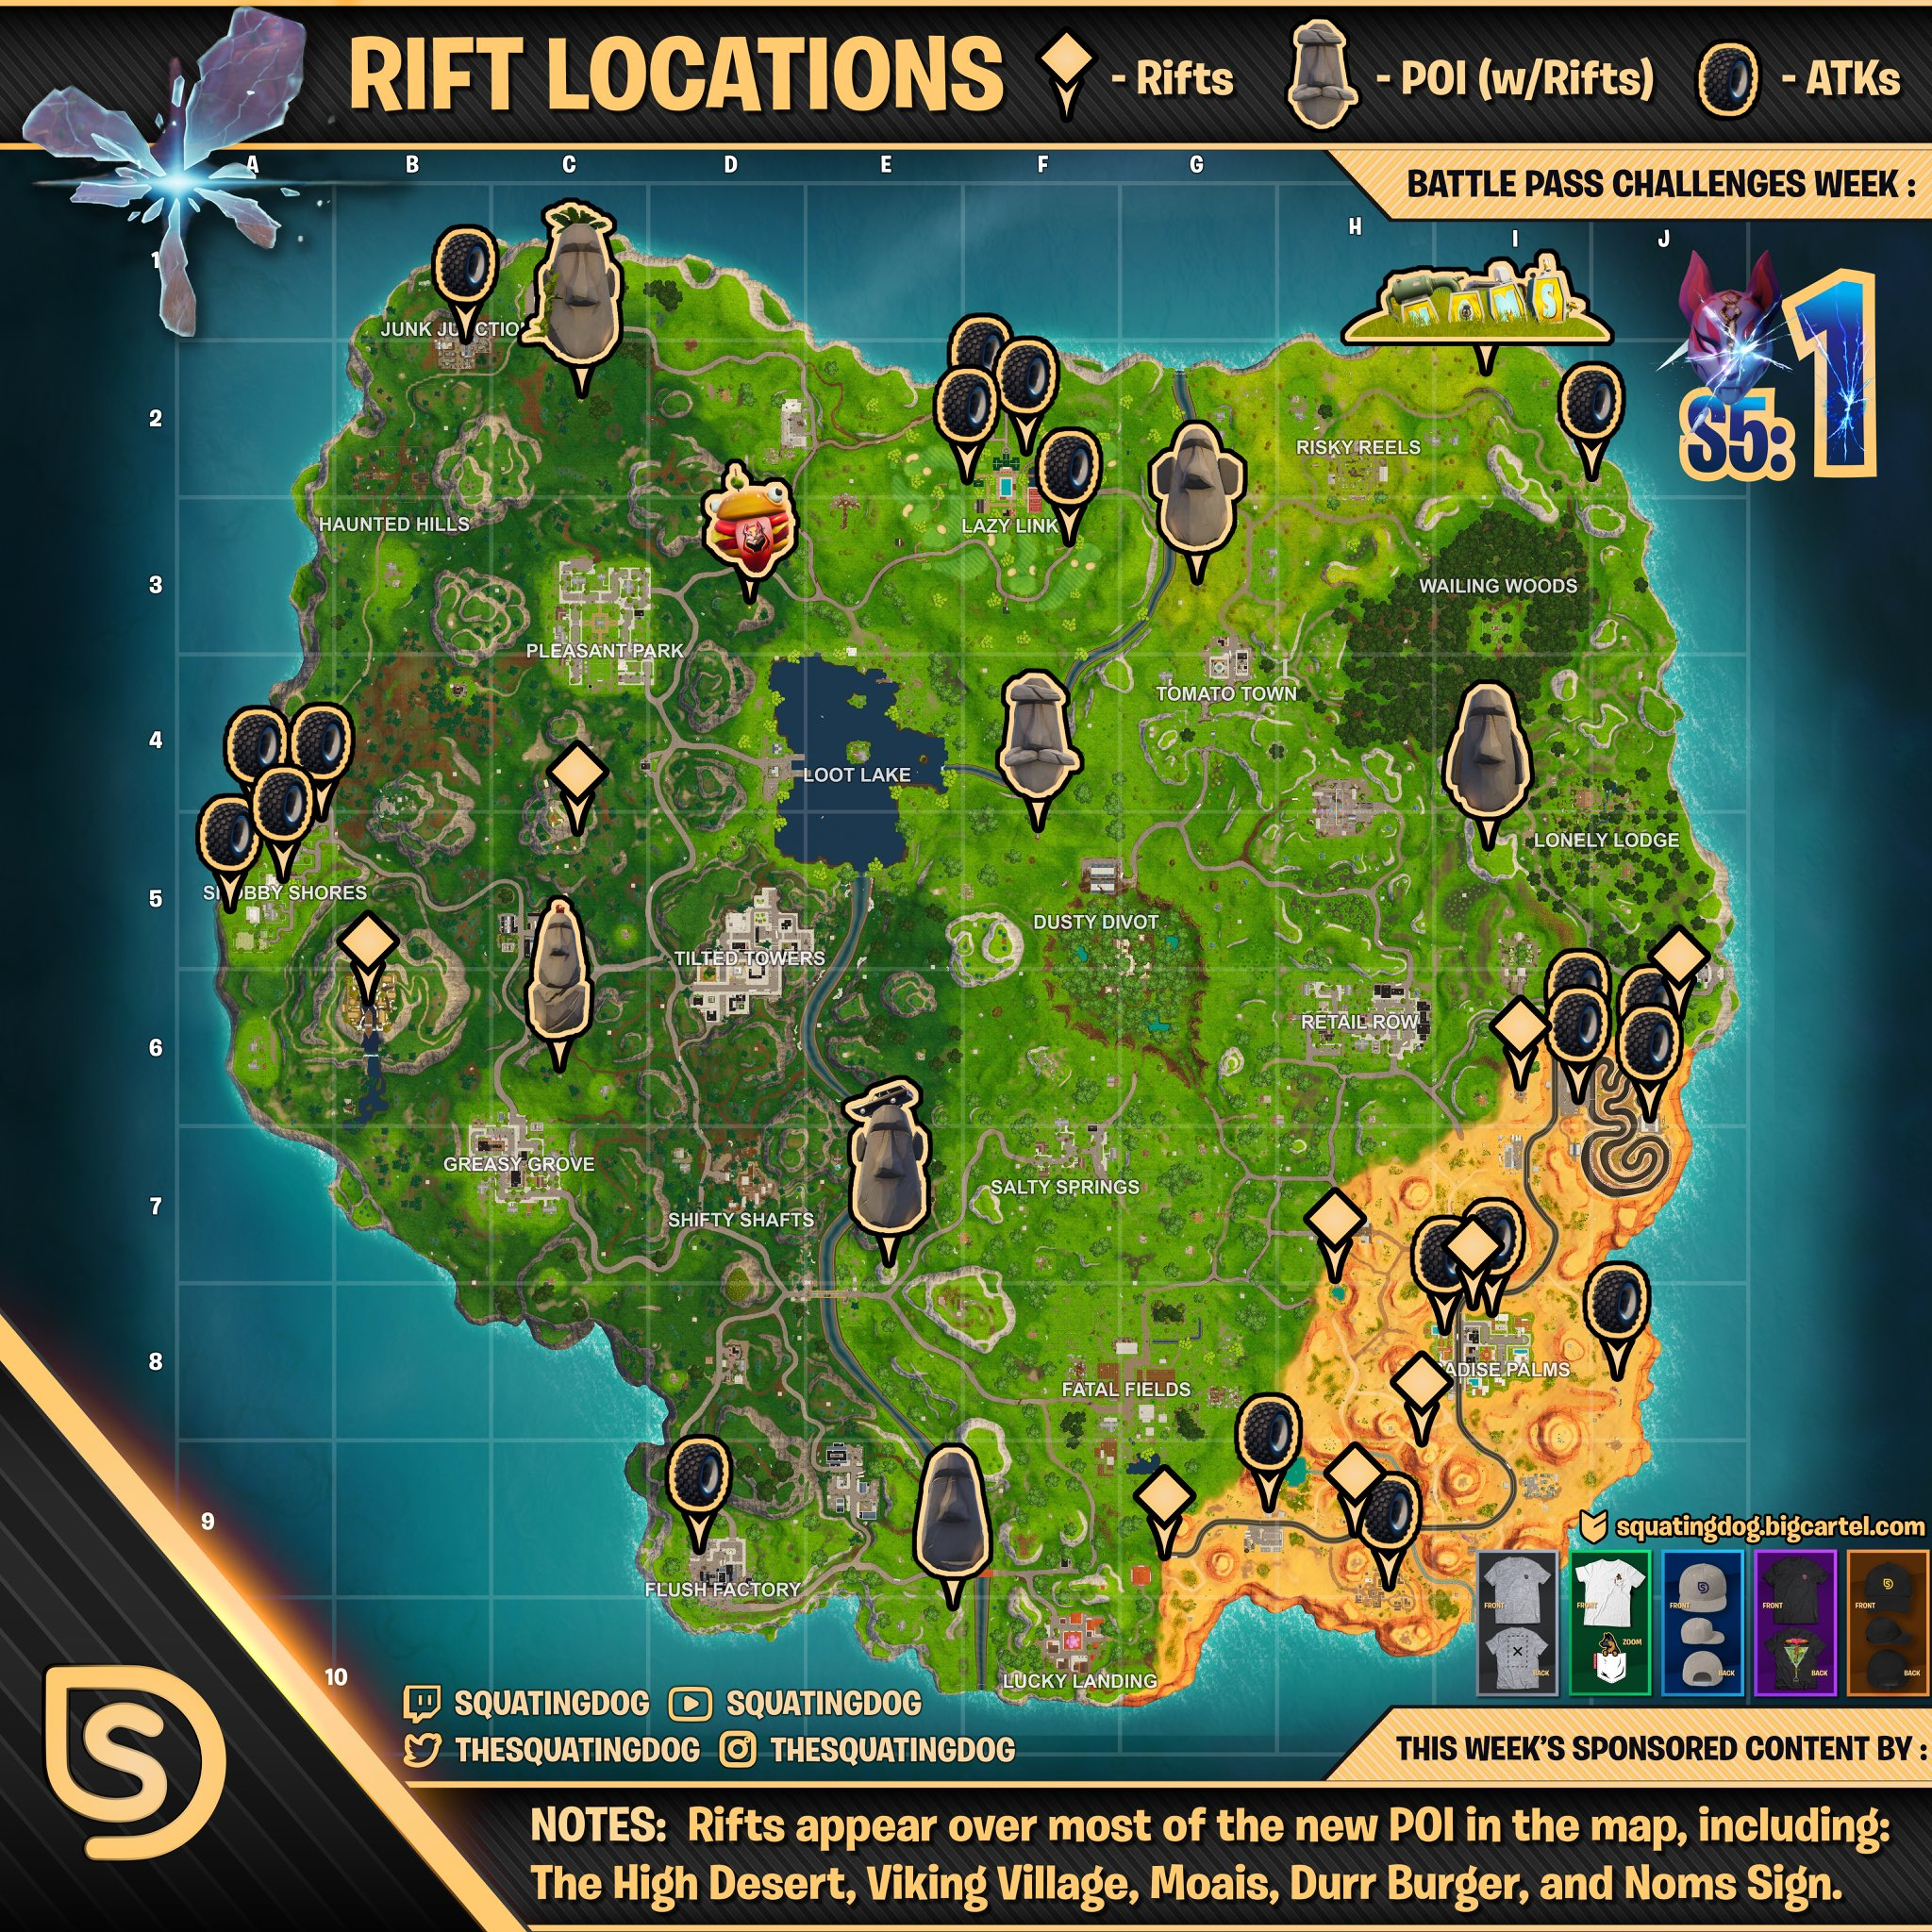 fortnite battle royale season 5 challenges week 1 - fortnite s8 week 6 cheat sheet